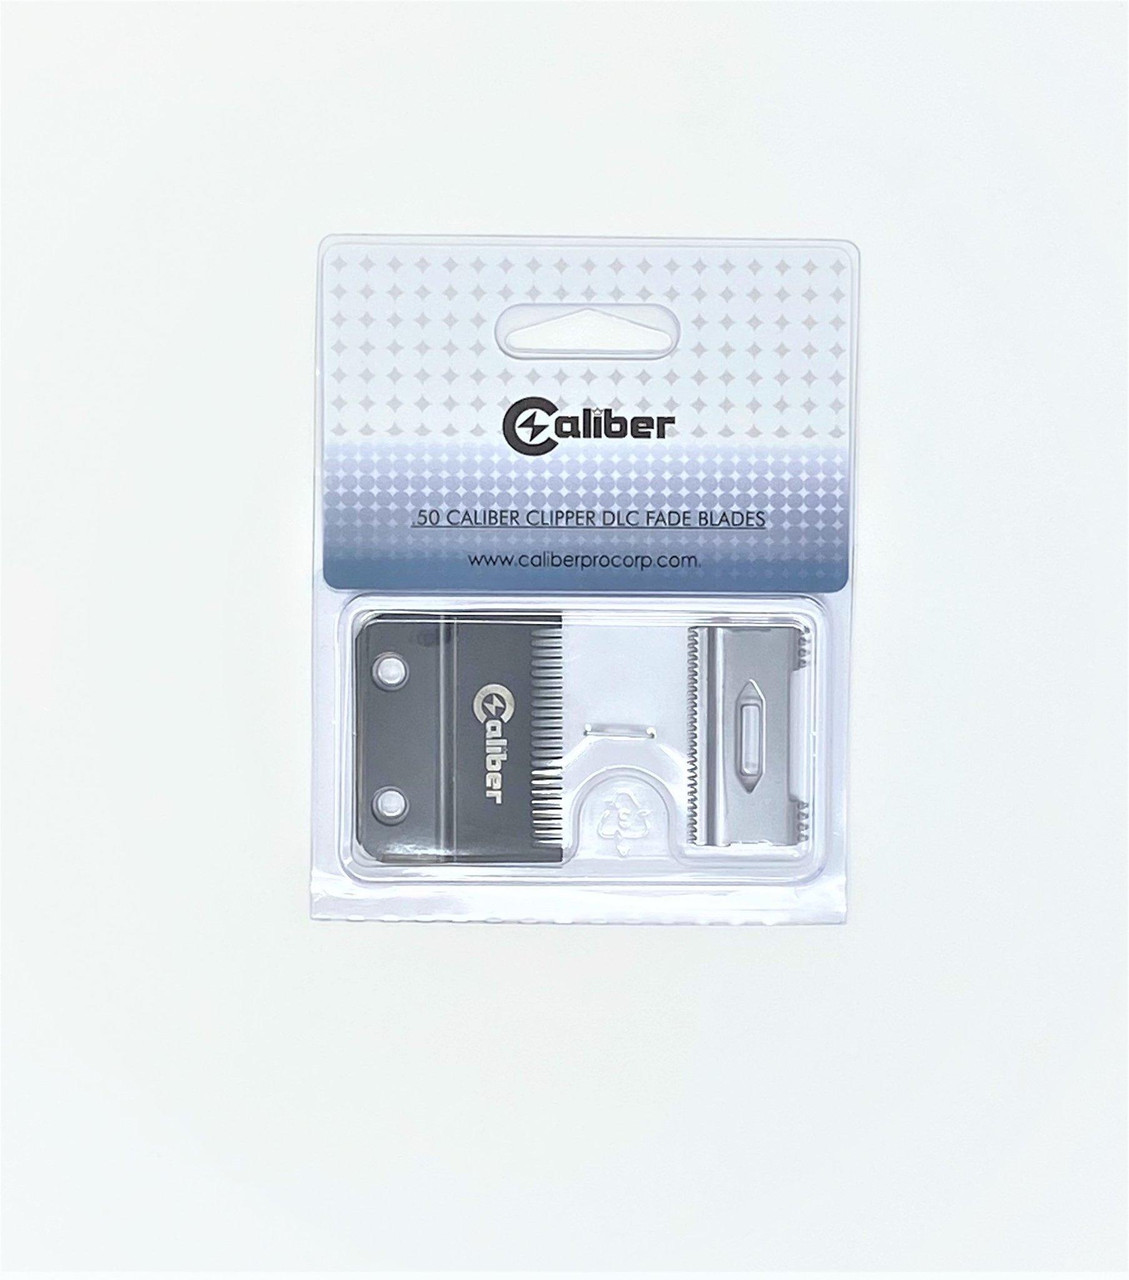 Caliber .50 Mag Clipper Replacement DLC Fade Blade